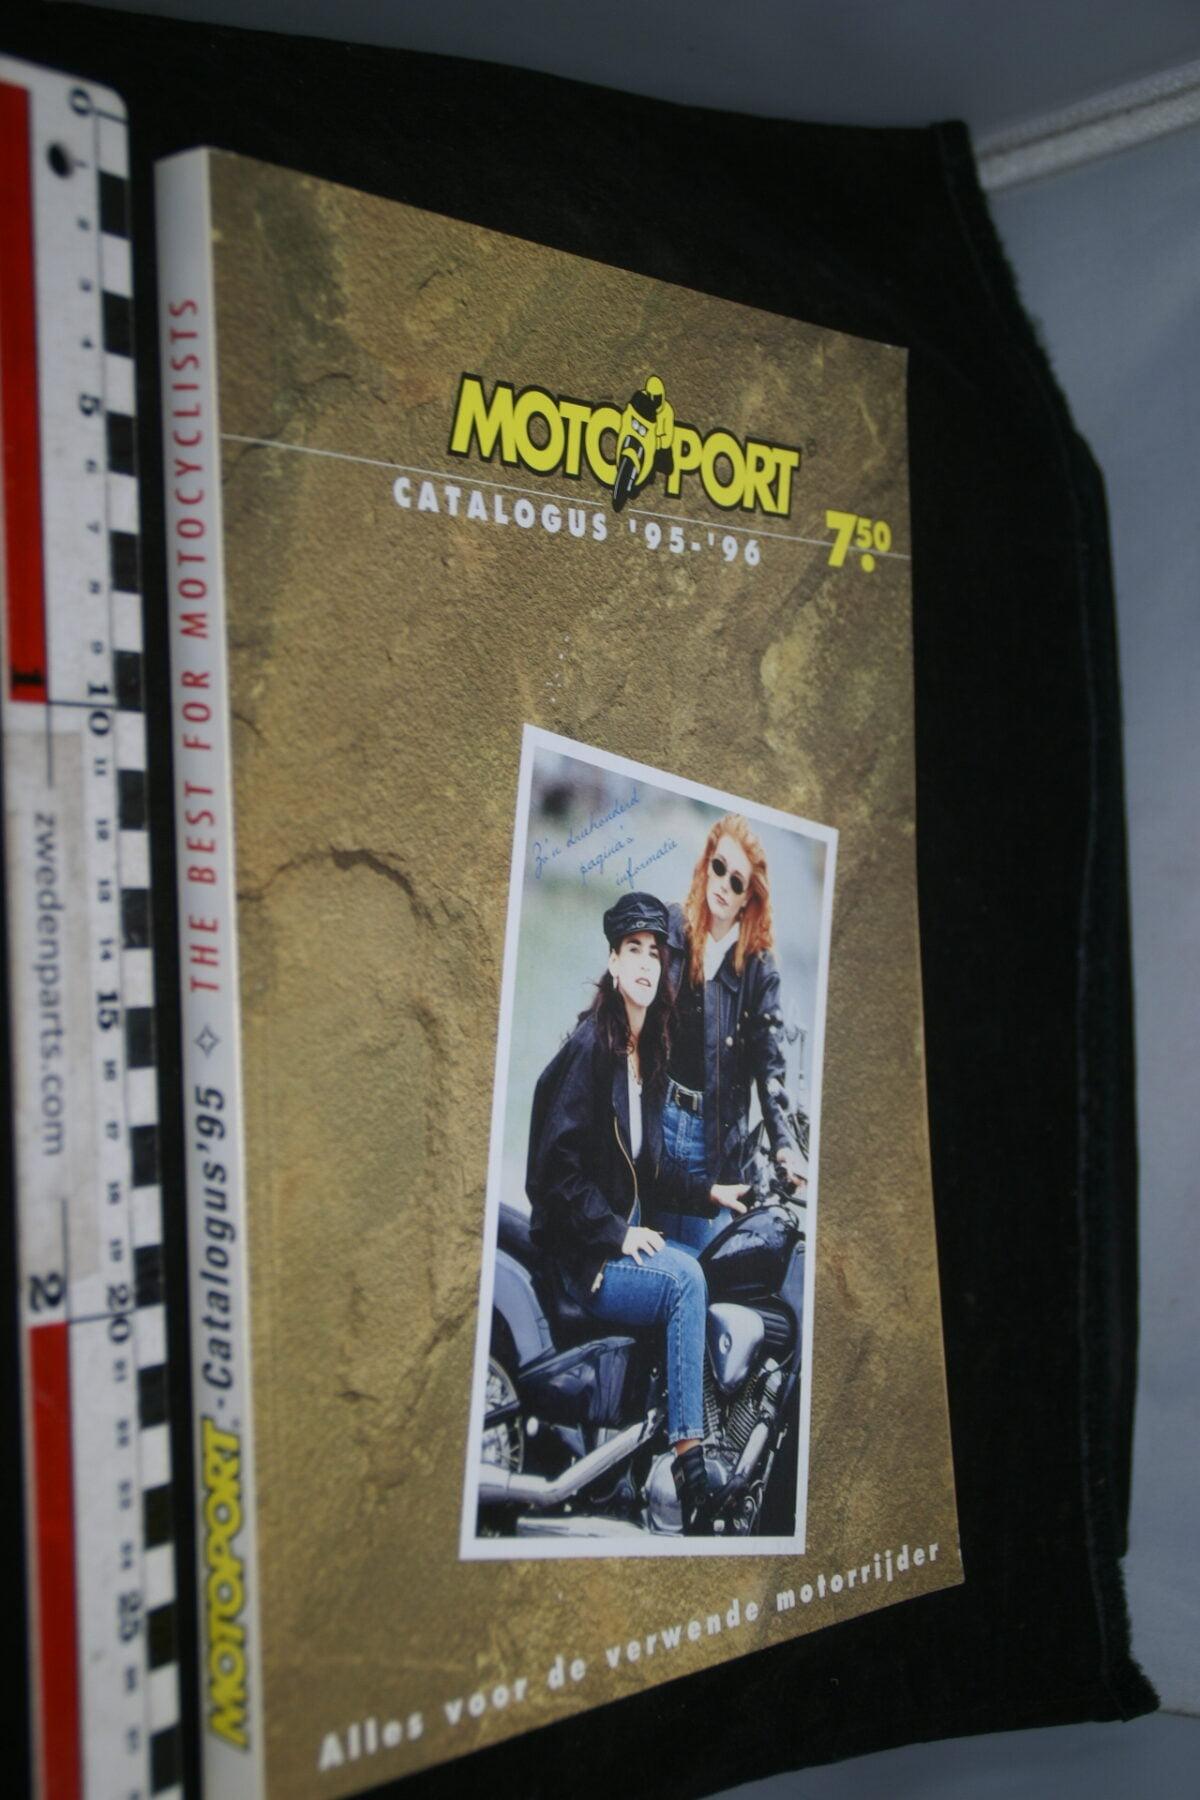 DSC02212 1995 96 originele catalogus Motorsport-631b784f